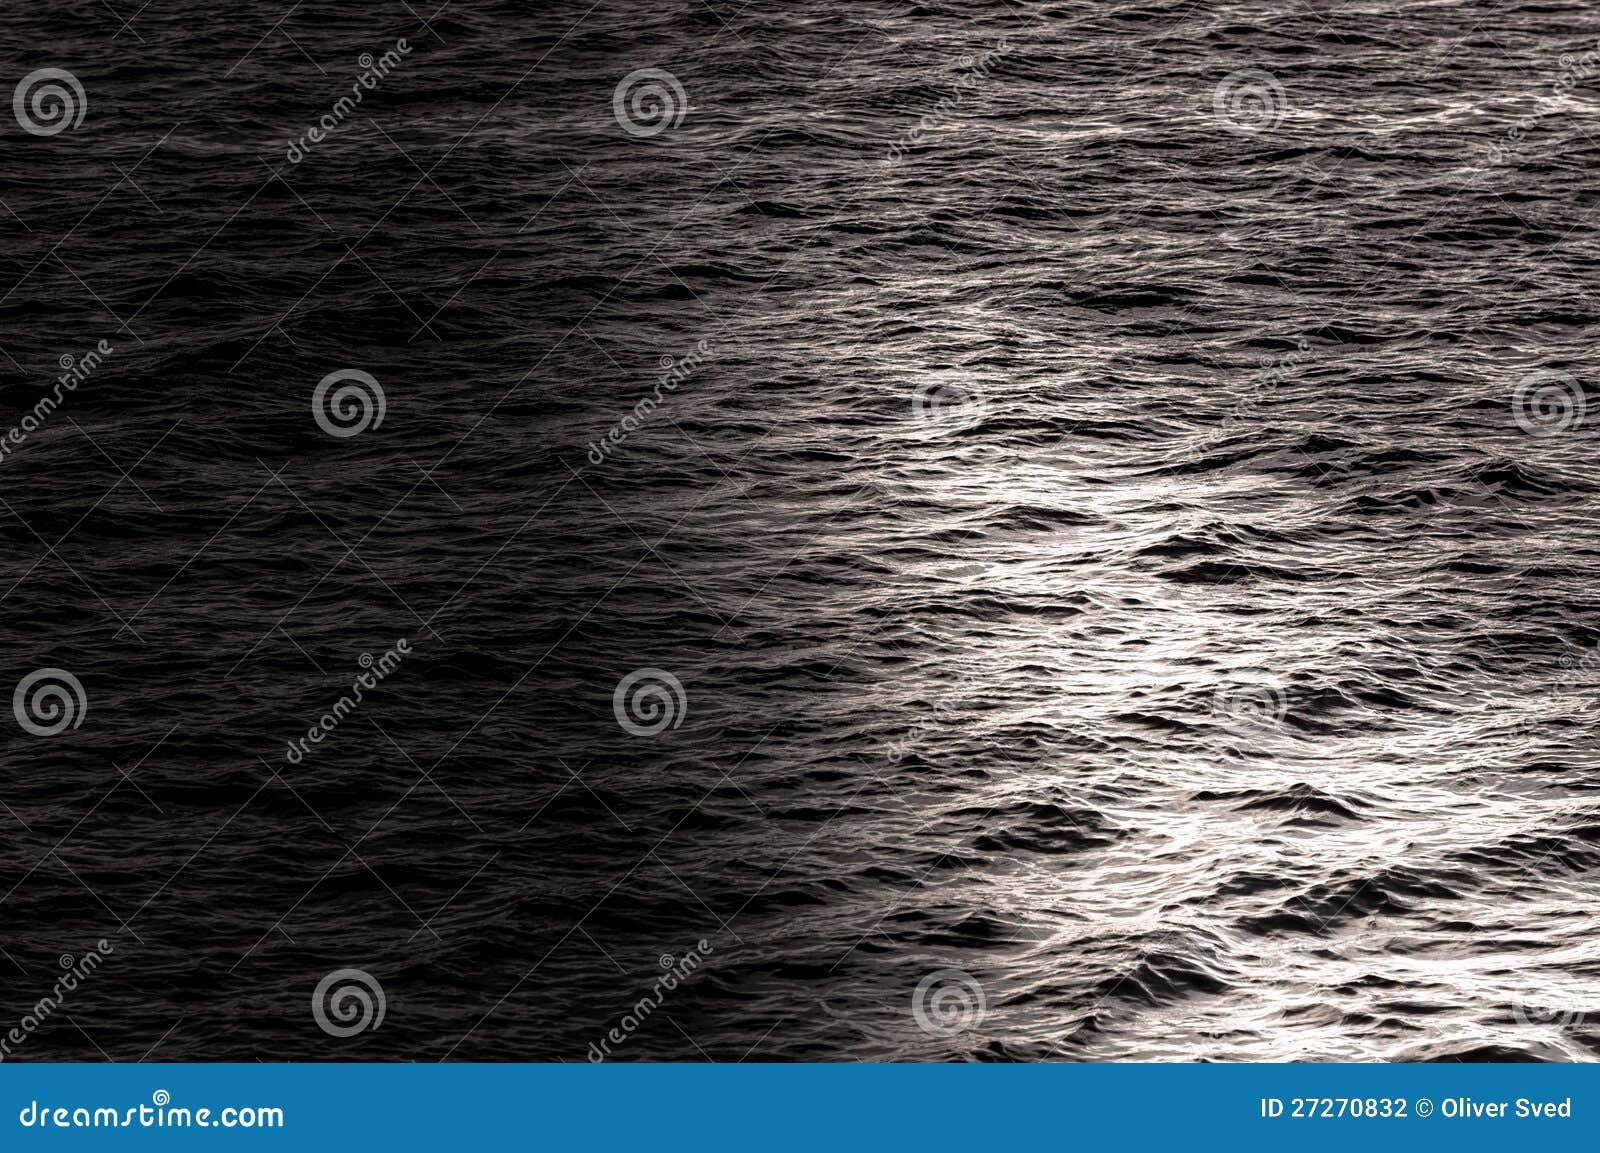 deep dark water stock photography image 27270832